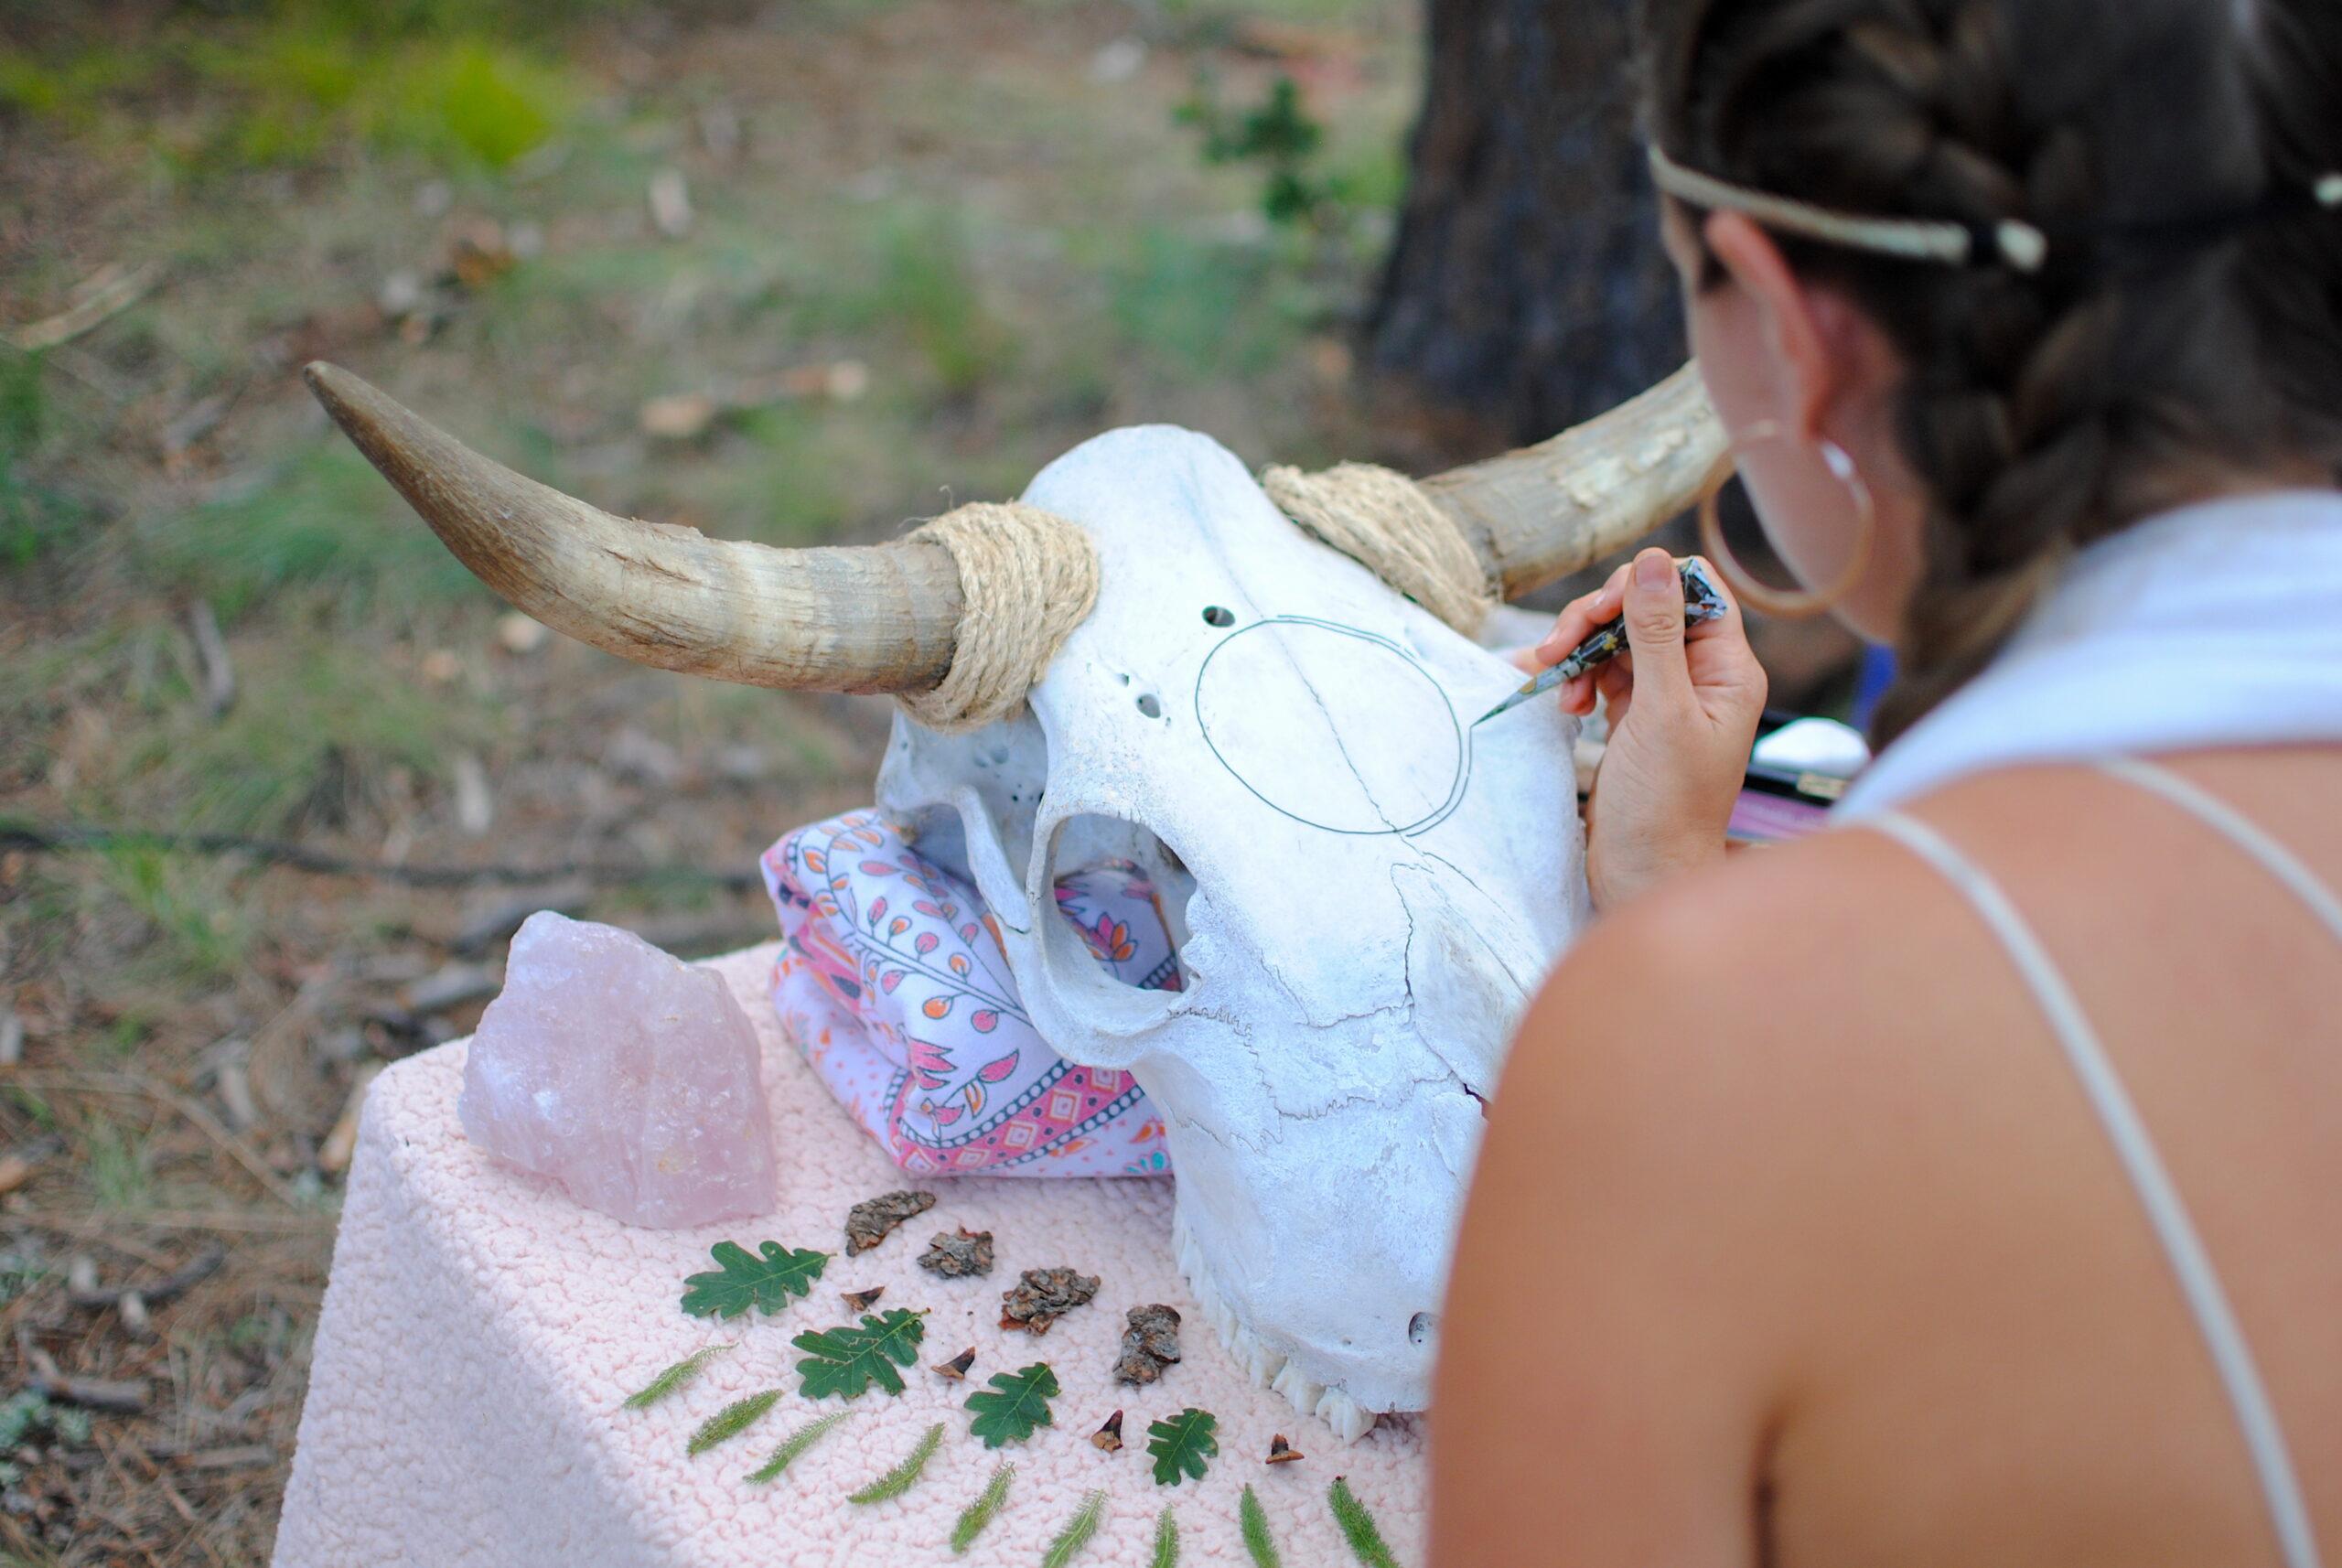 A henna artist applies design to a cow skull during Rogue Reverie Soundbath. Photo by: Marissa Novel.